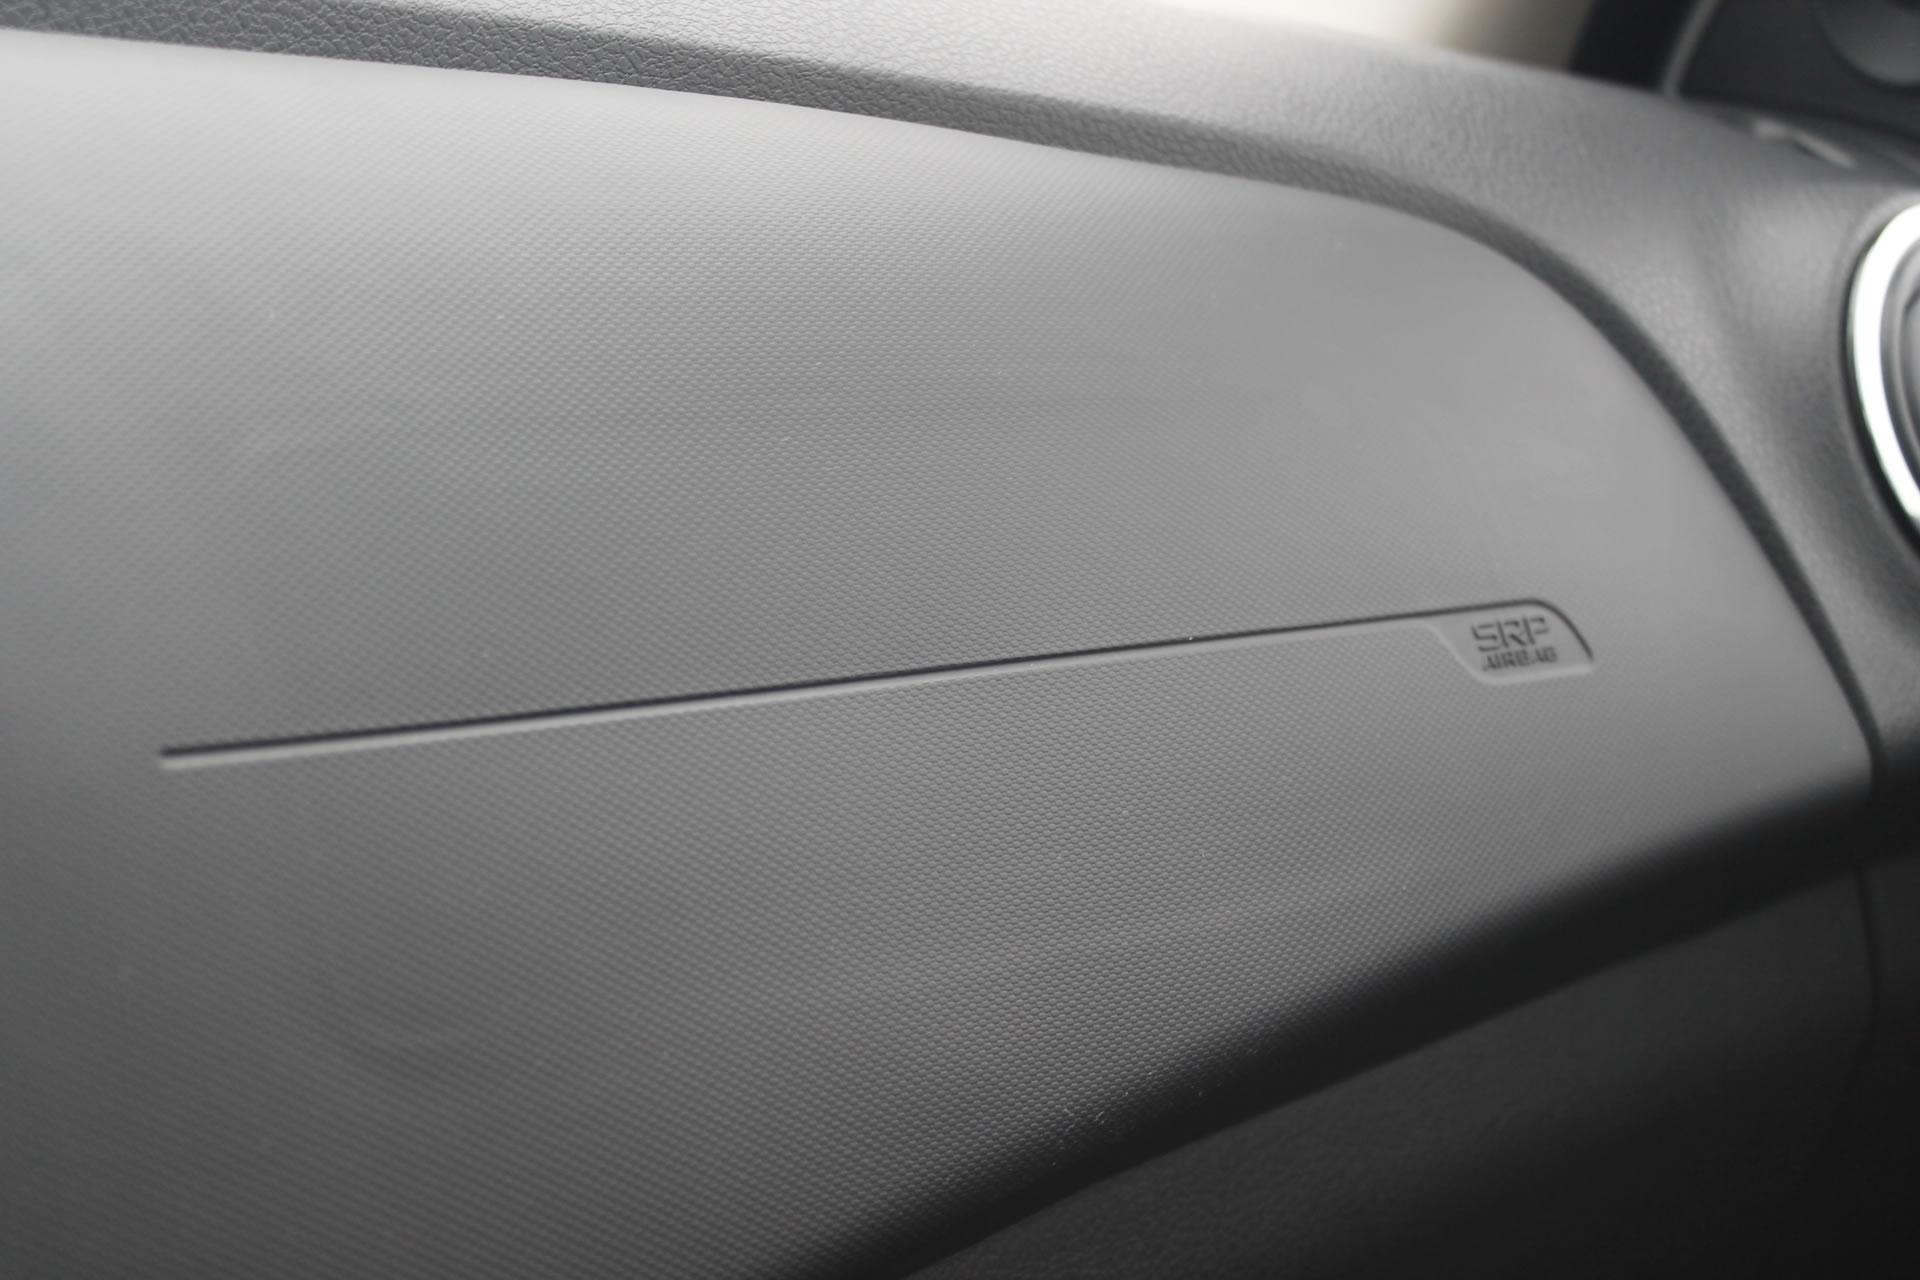 2015 Renault Symbol 1.5 dCi Joy 75 PS İncelemesi